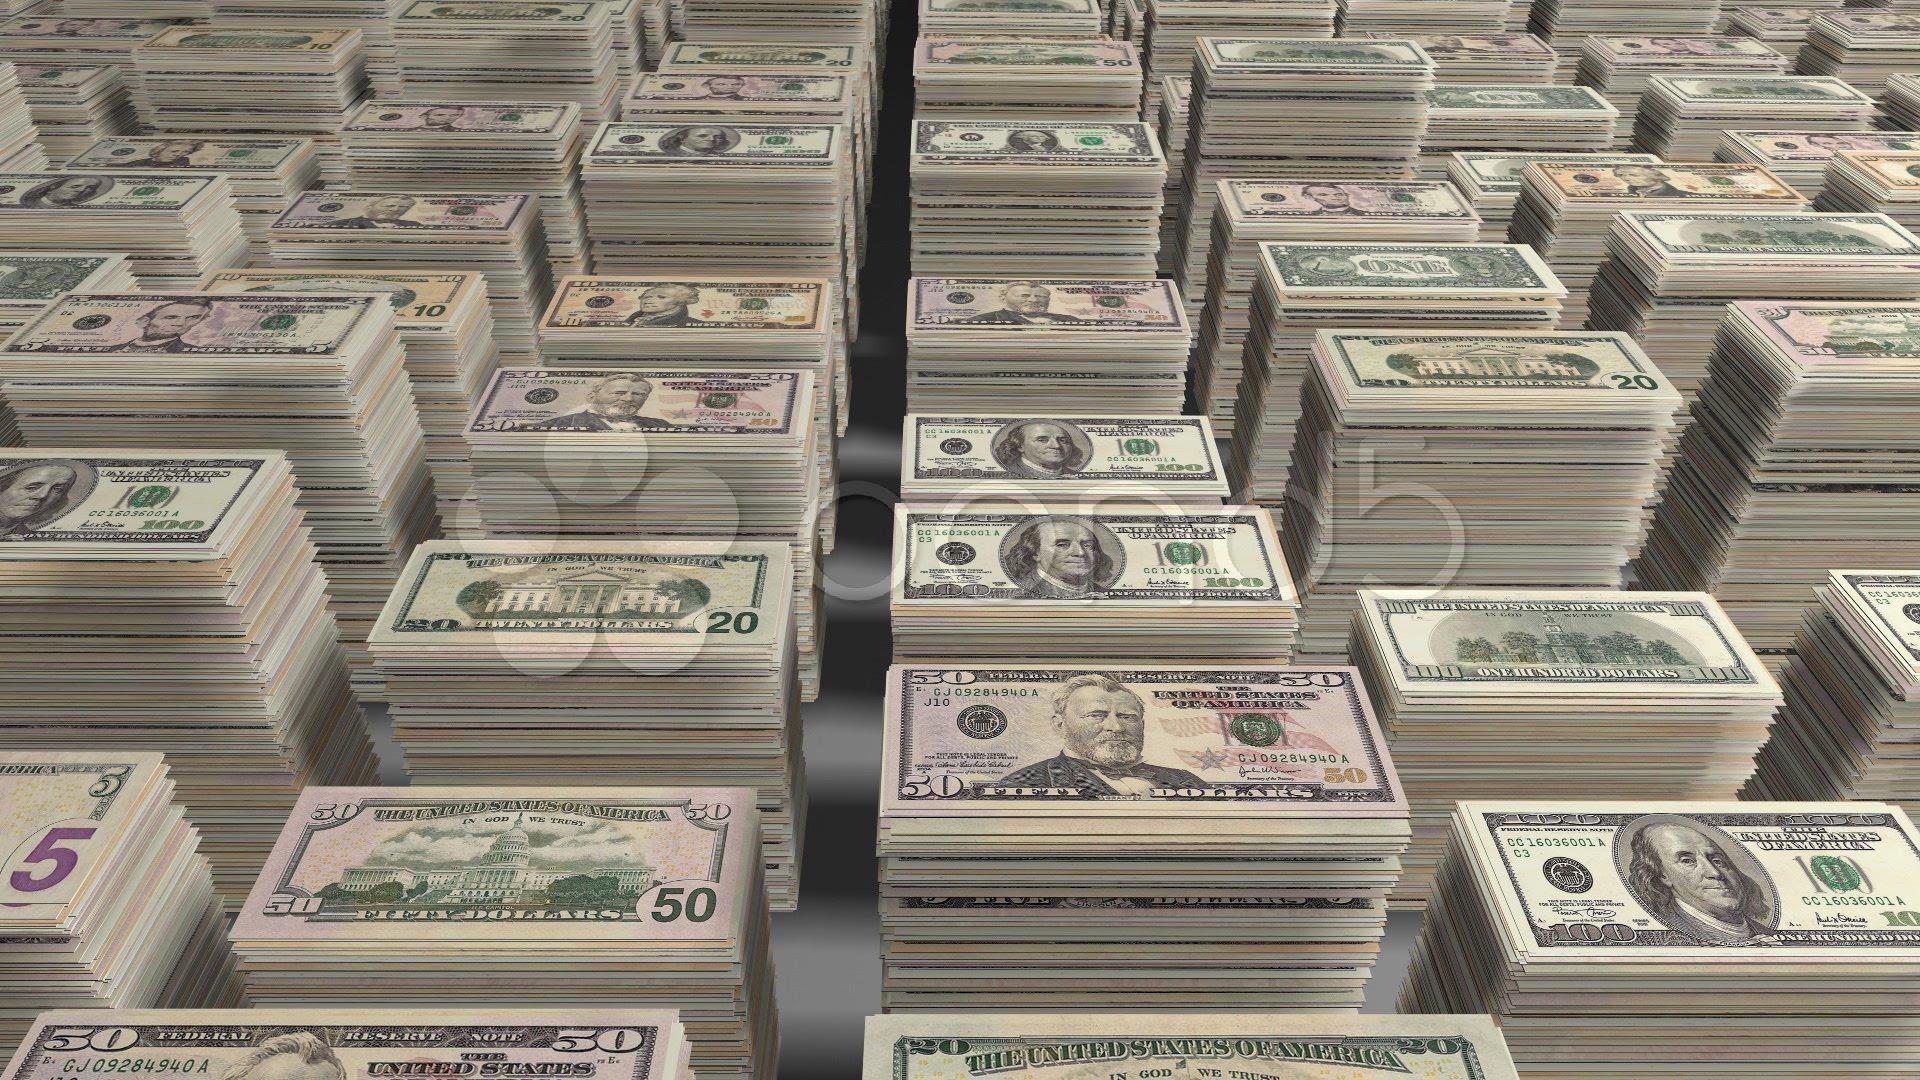 Stacks-of-money-HD-wallpapers